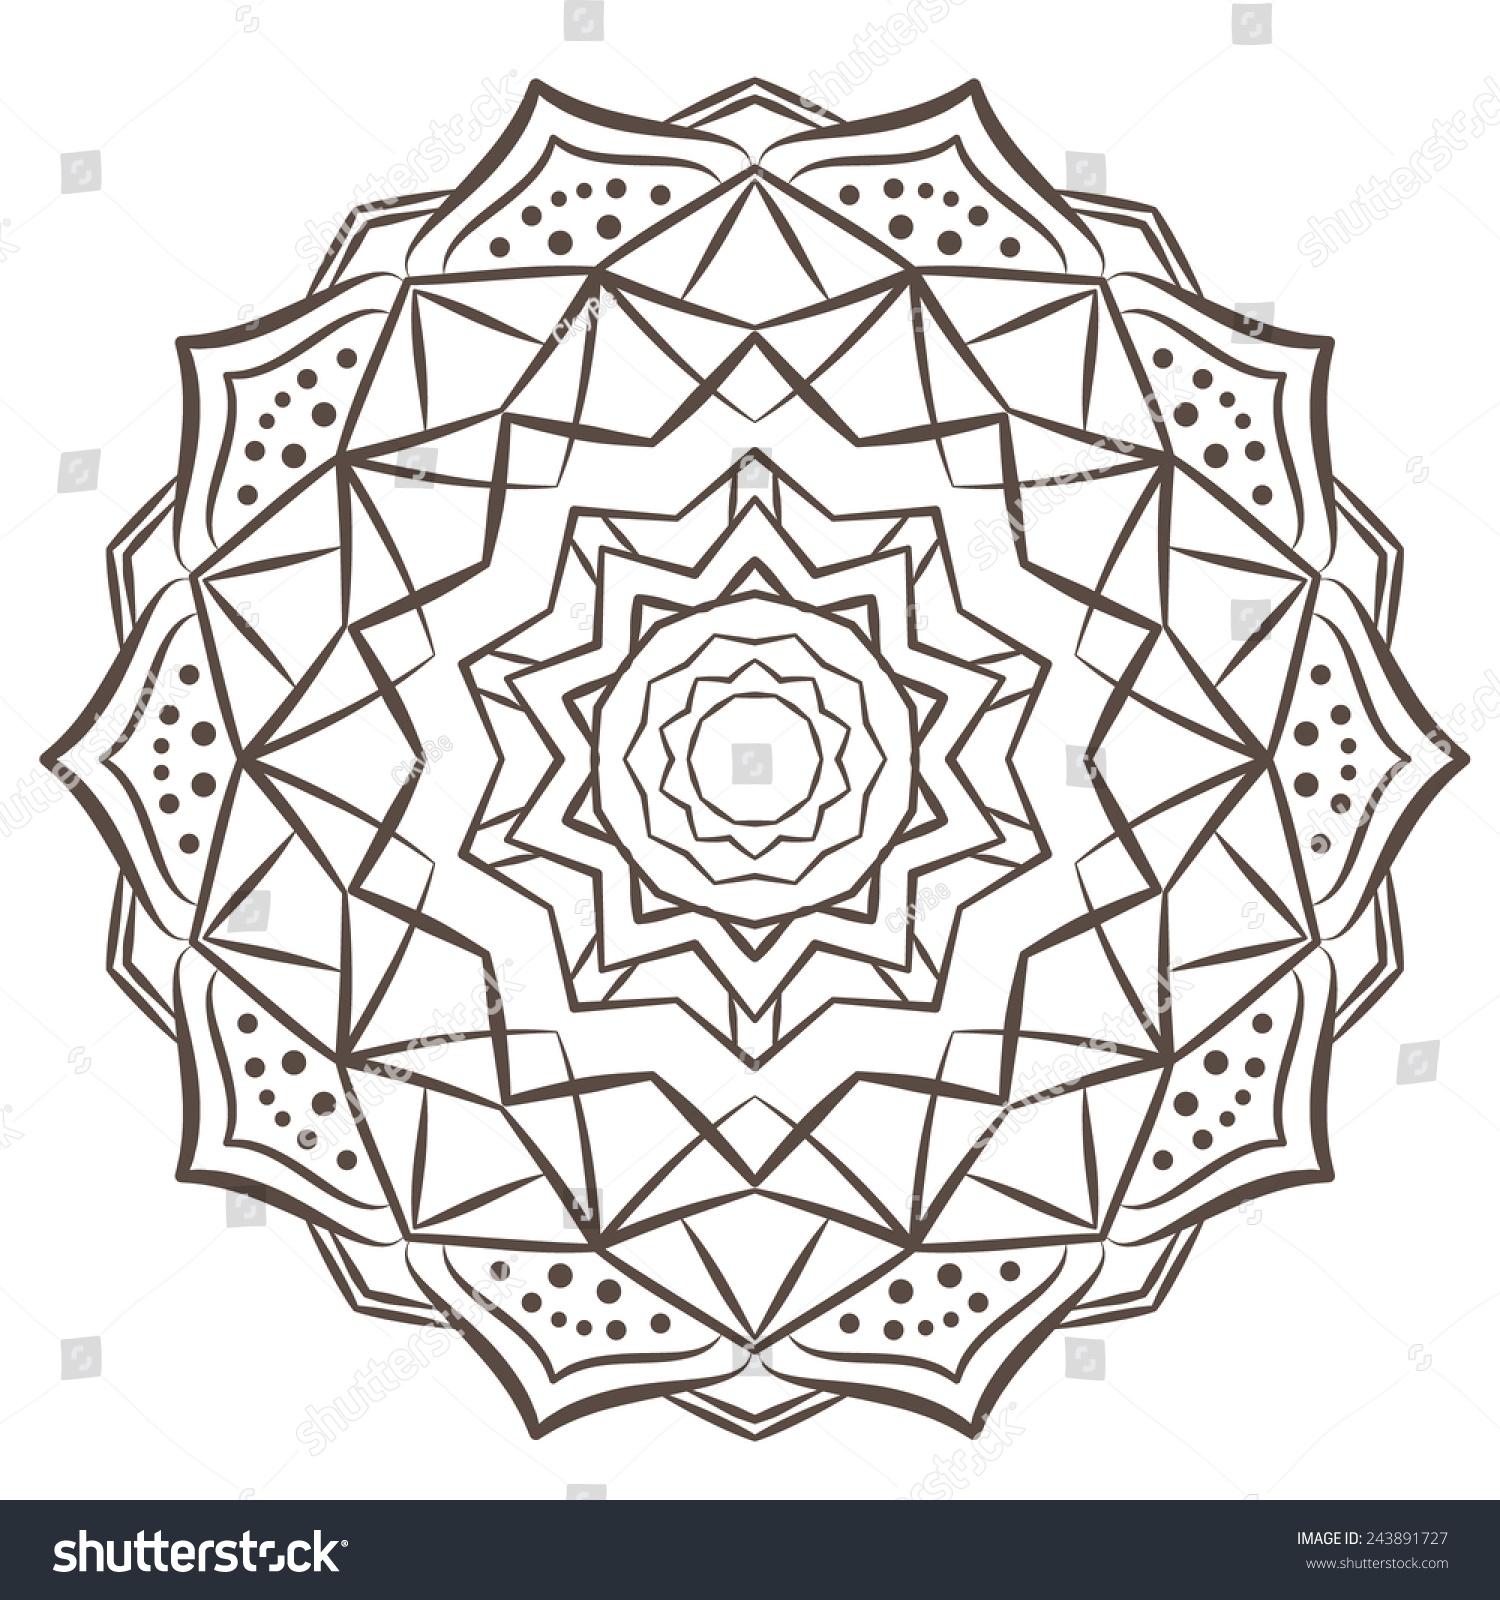 Ethnic Fractal Mandala Vector Meditation Tattoo Stock Vector ...